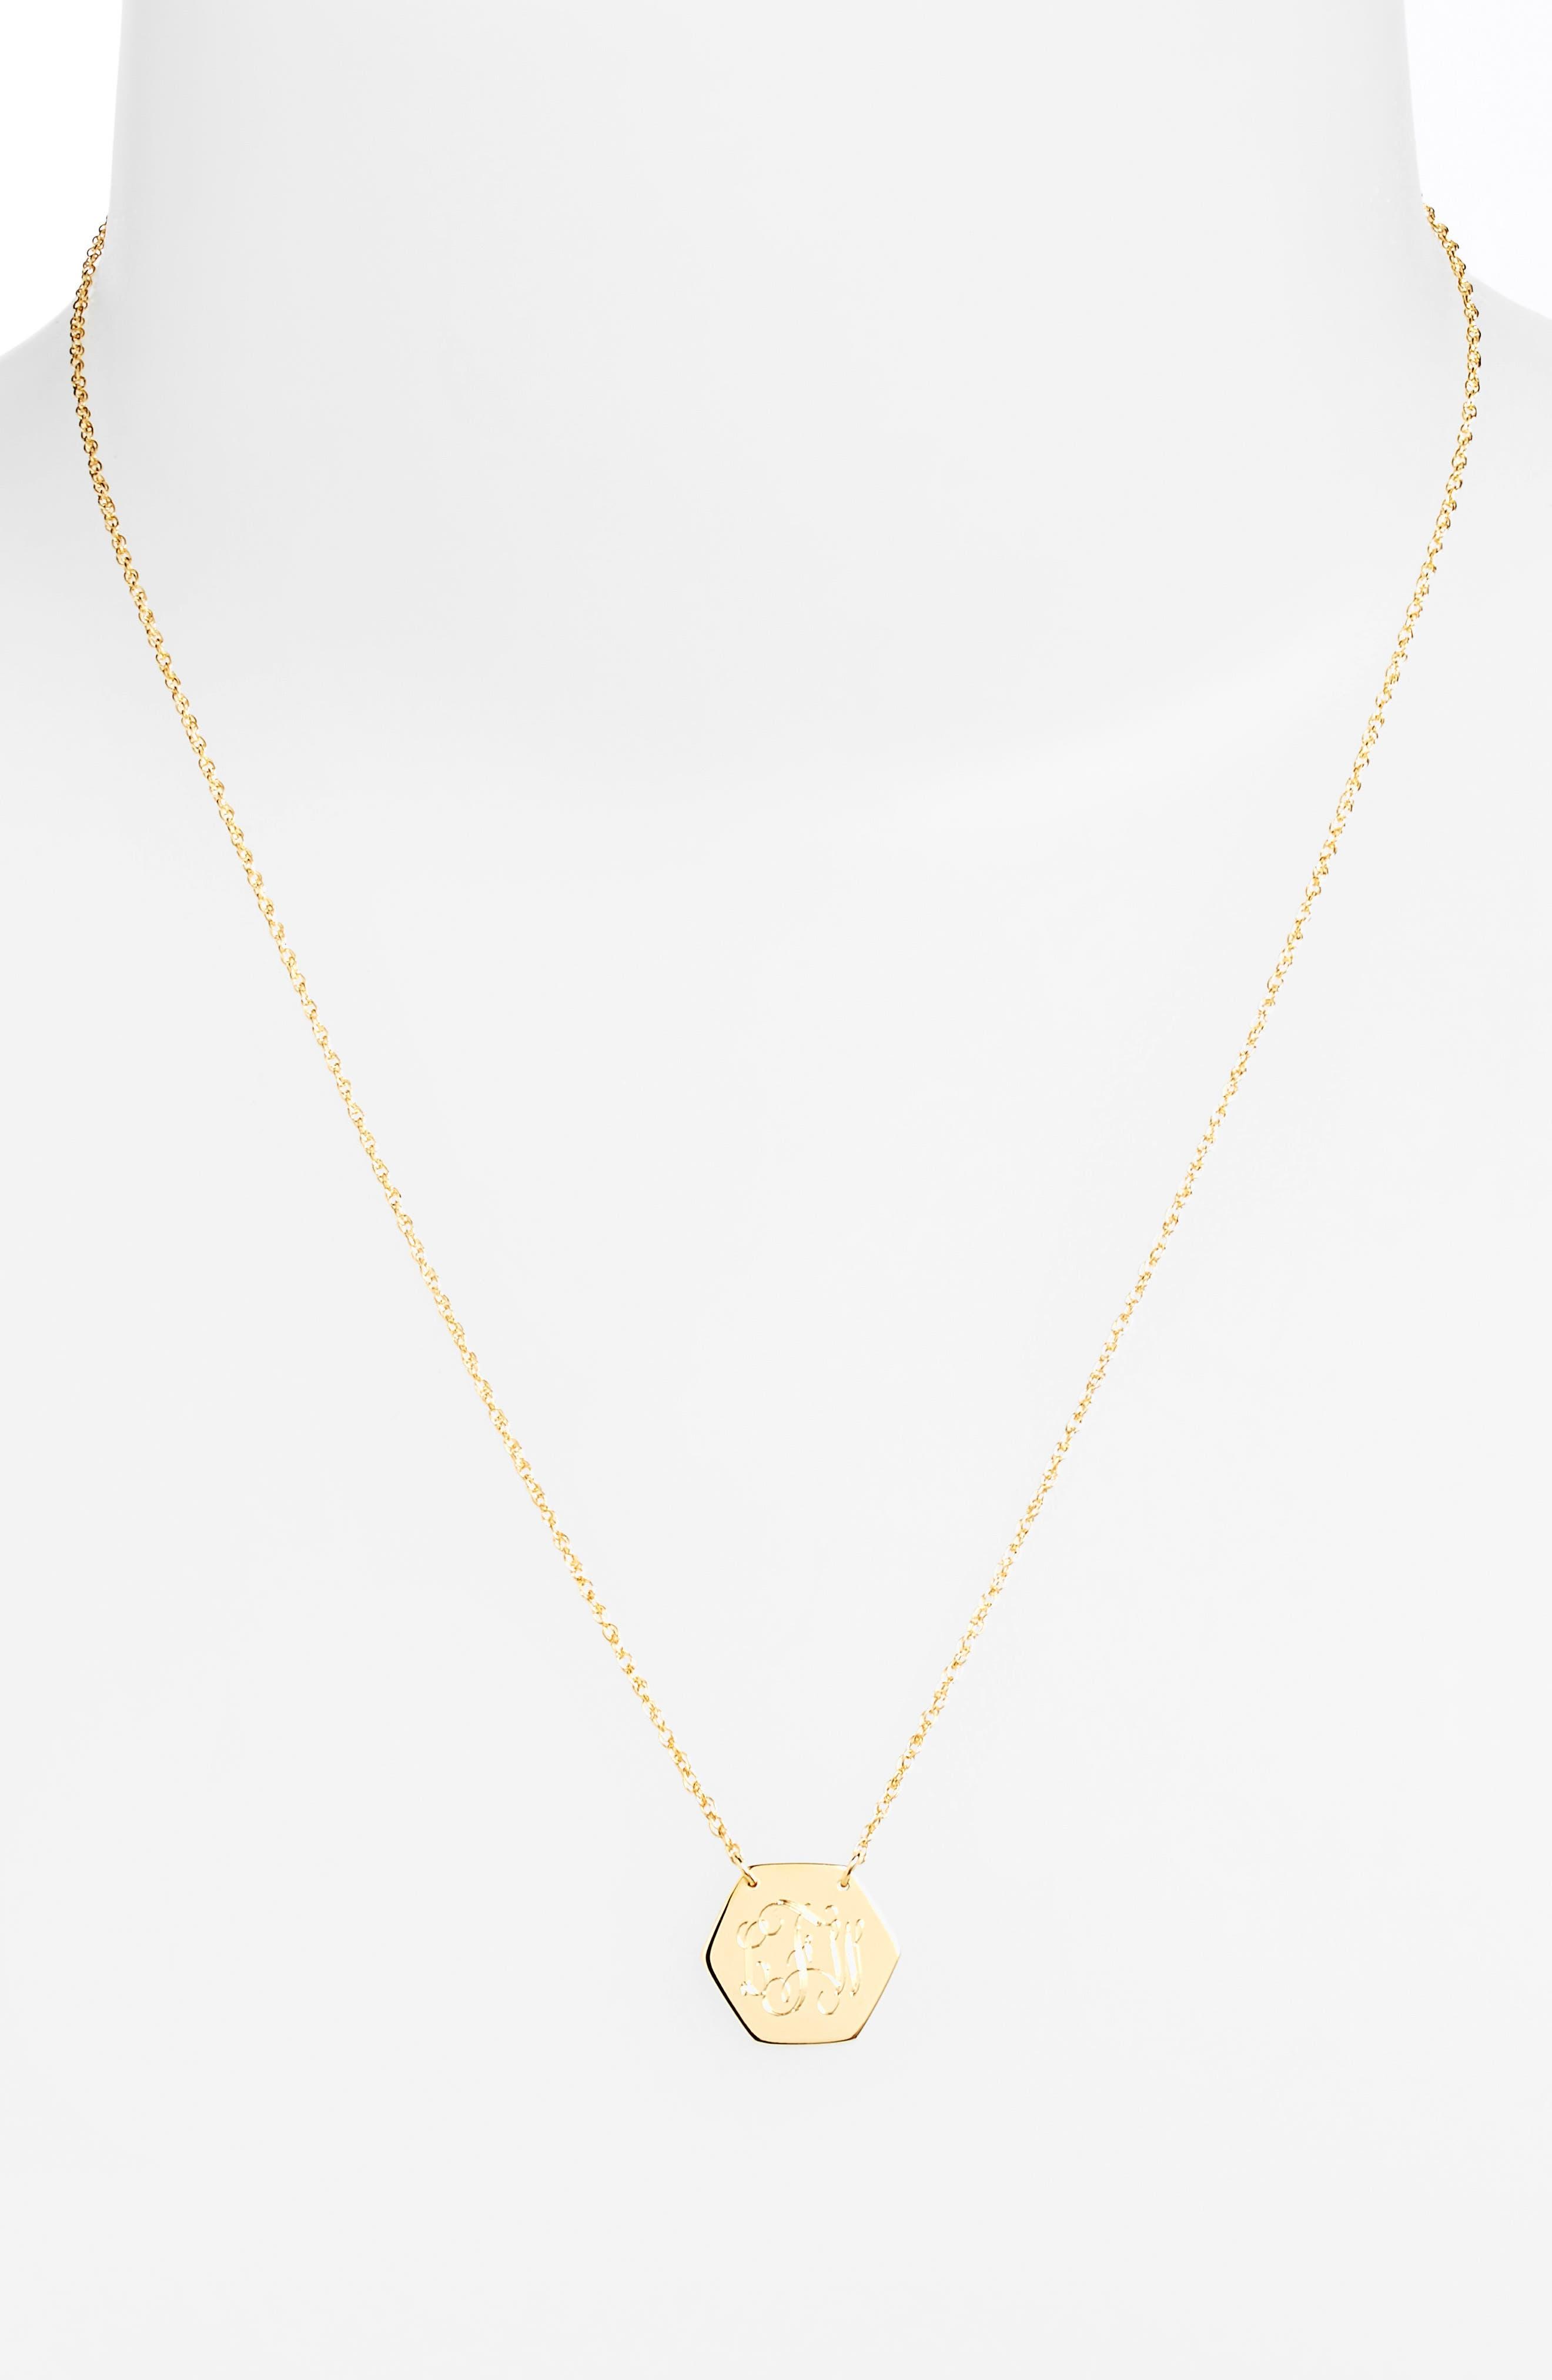 Personalized Hexagon Pendant Necklace,                             Alternate thumbnail 2, color,                             GOLD